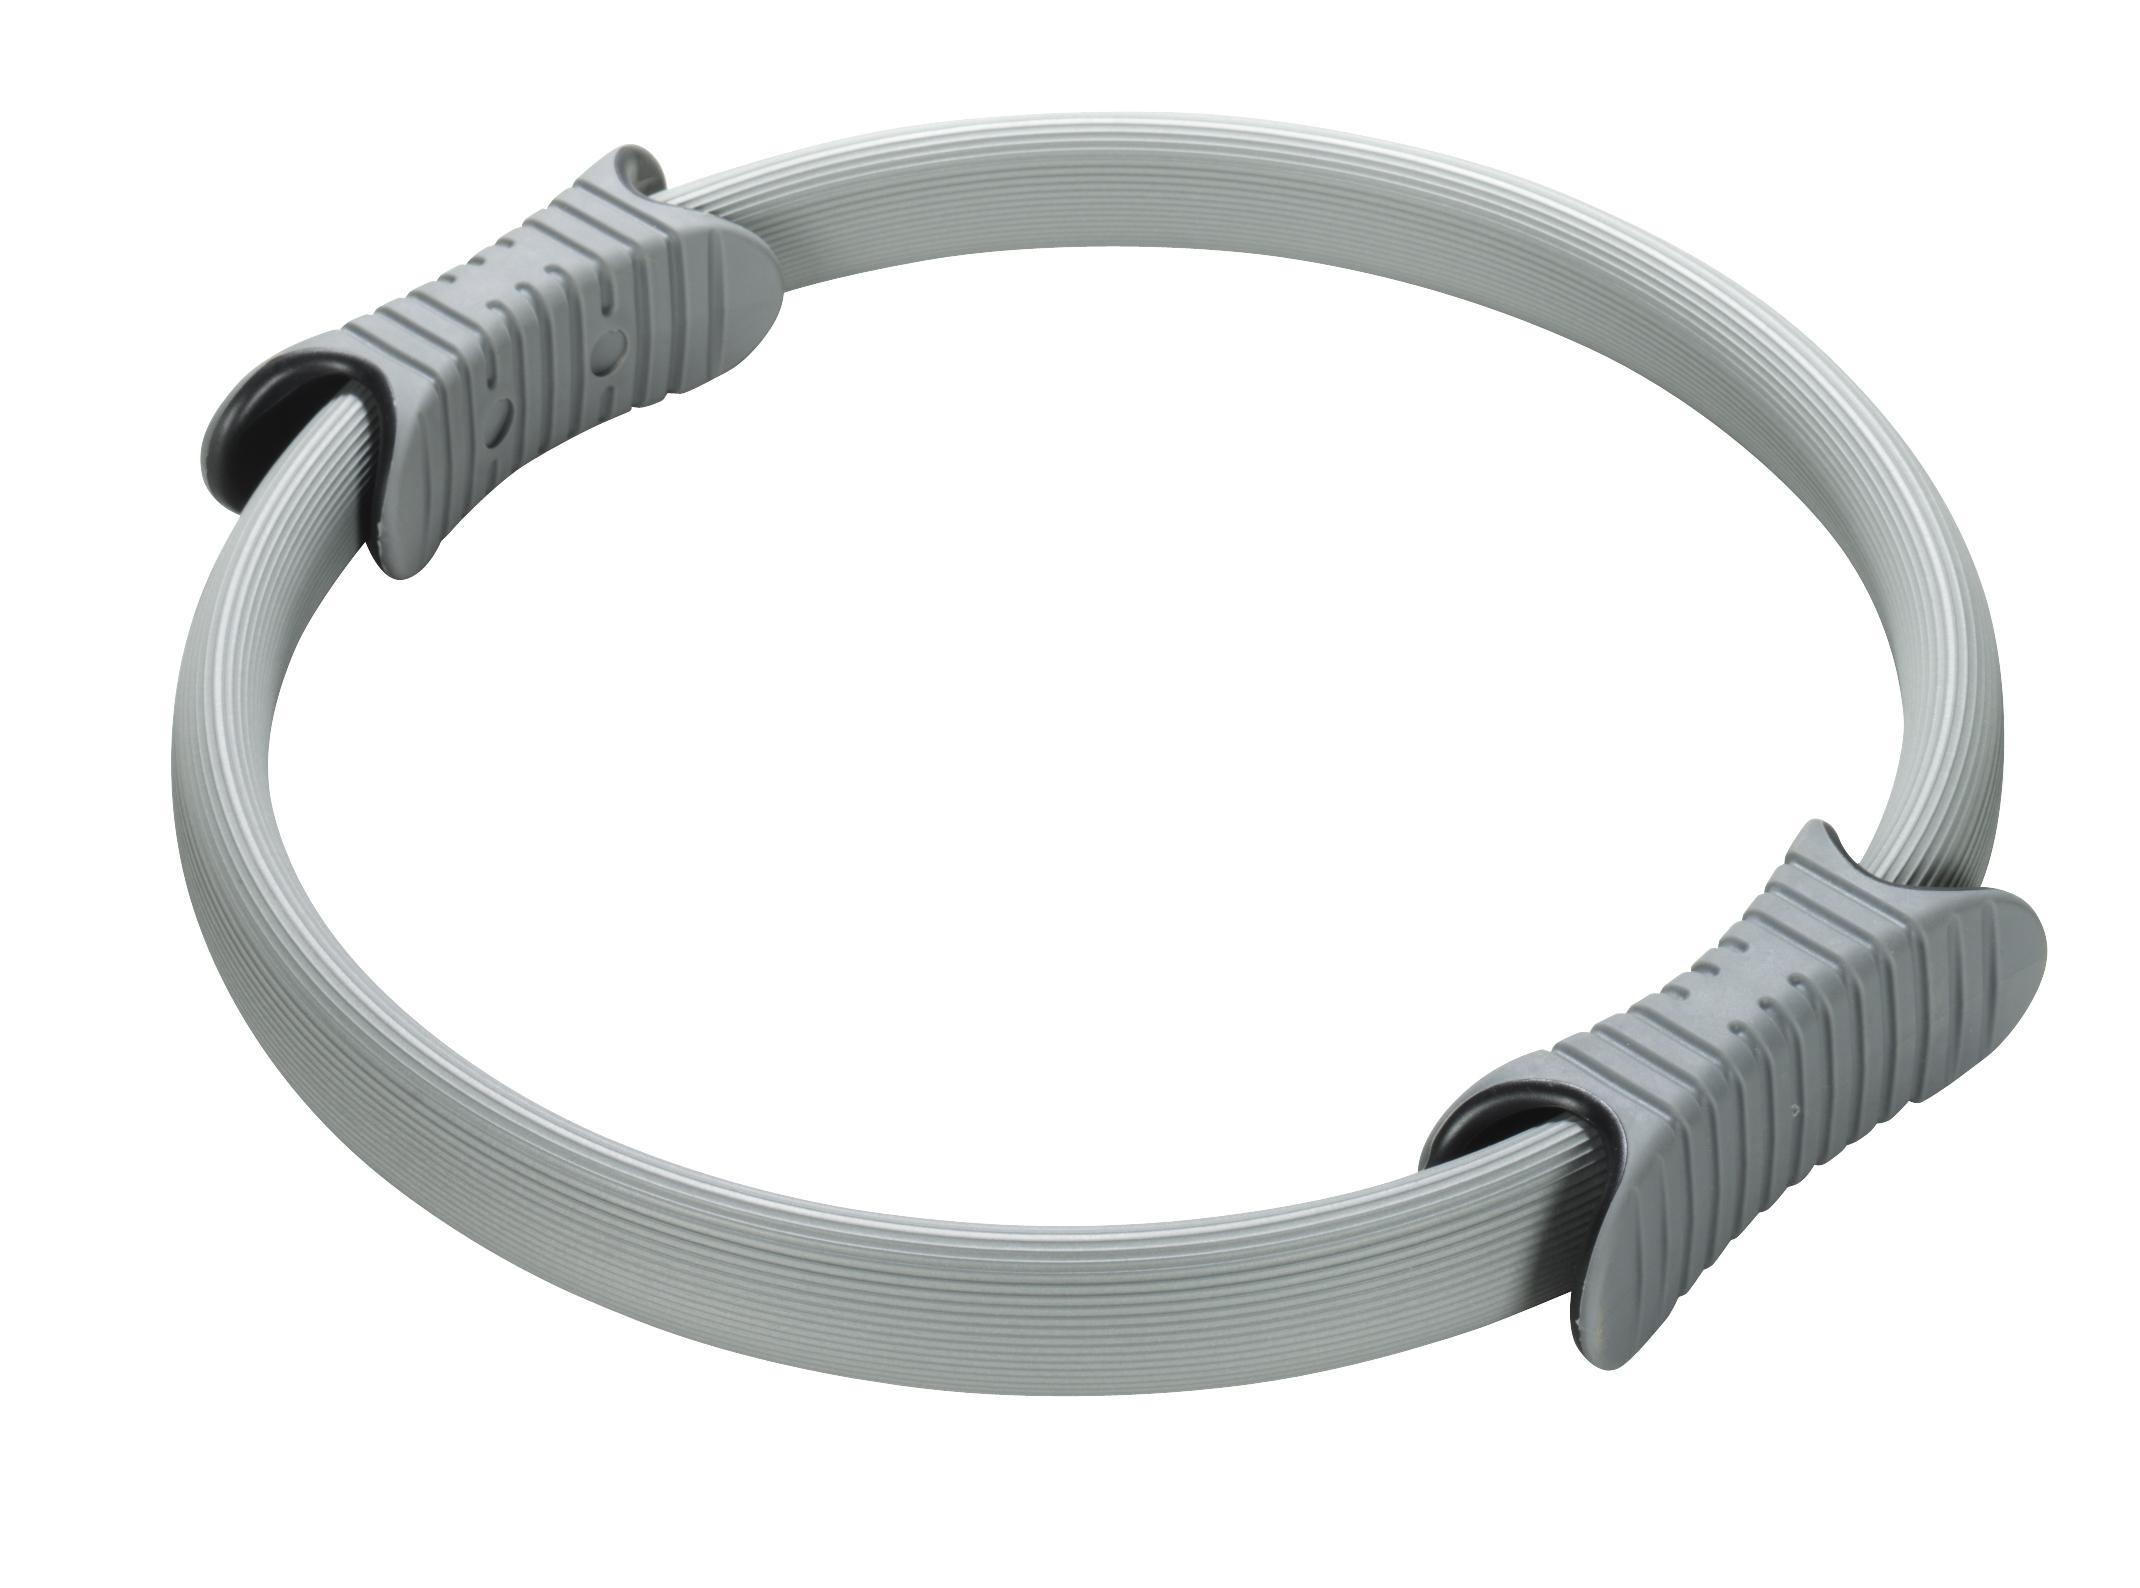 Trendy Sport Pilates Ring - Grey - 38 cm